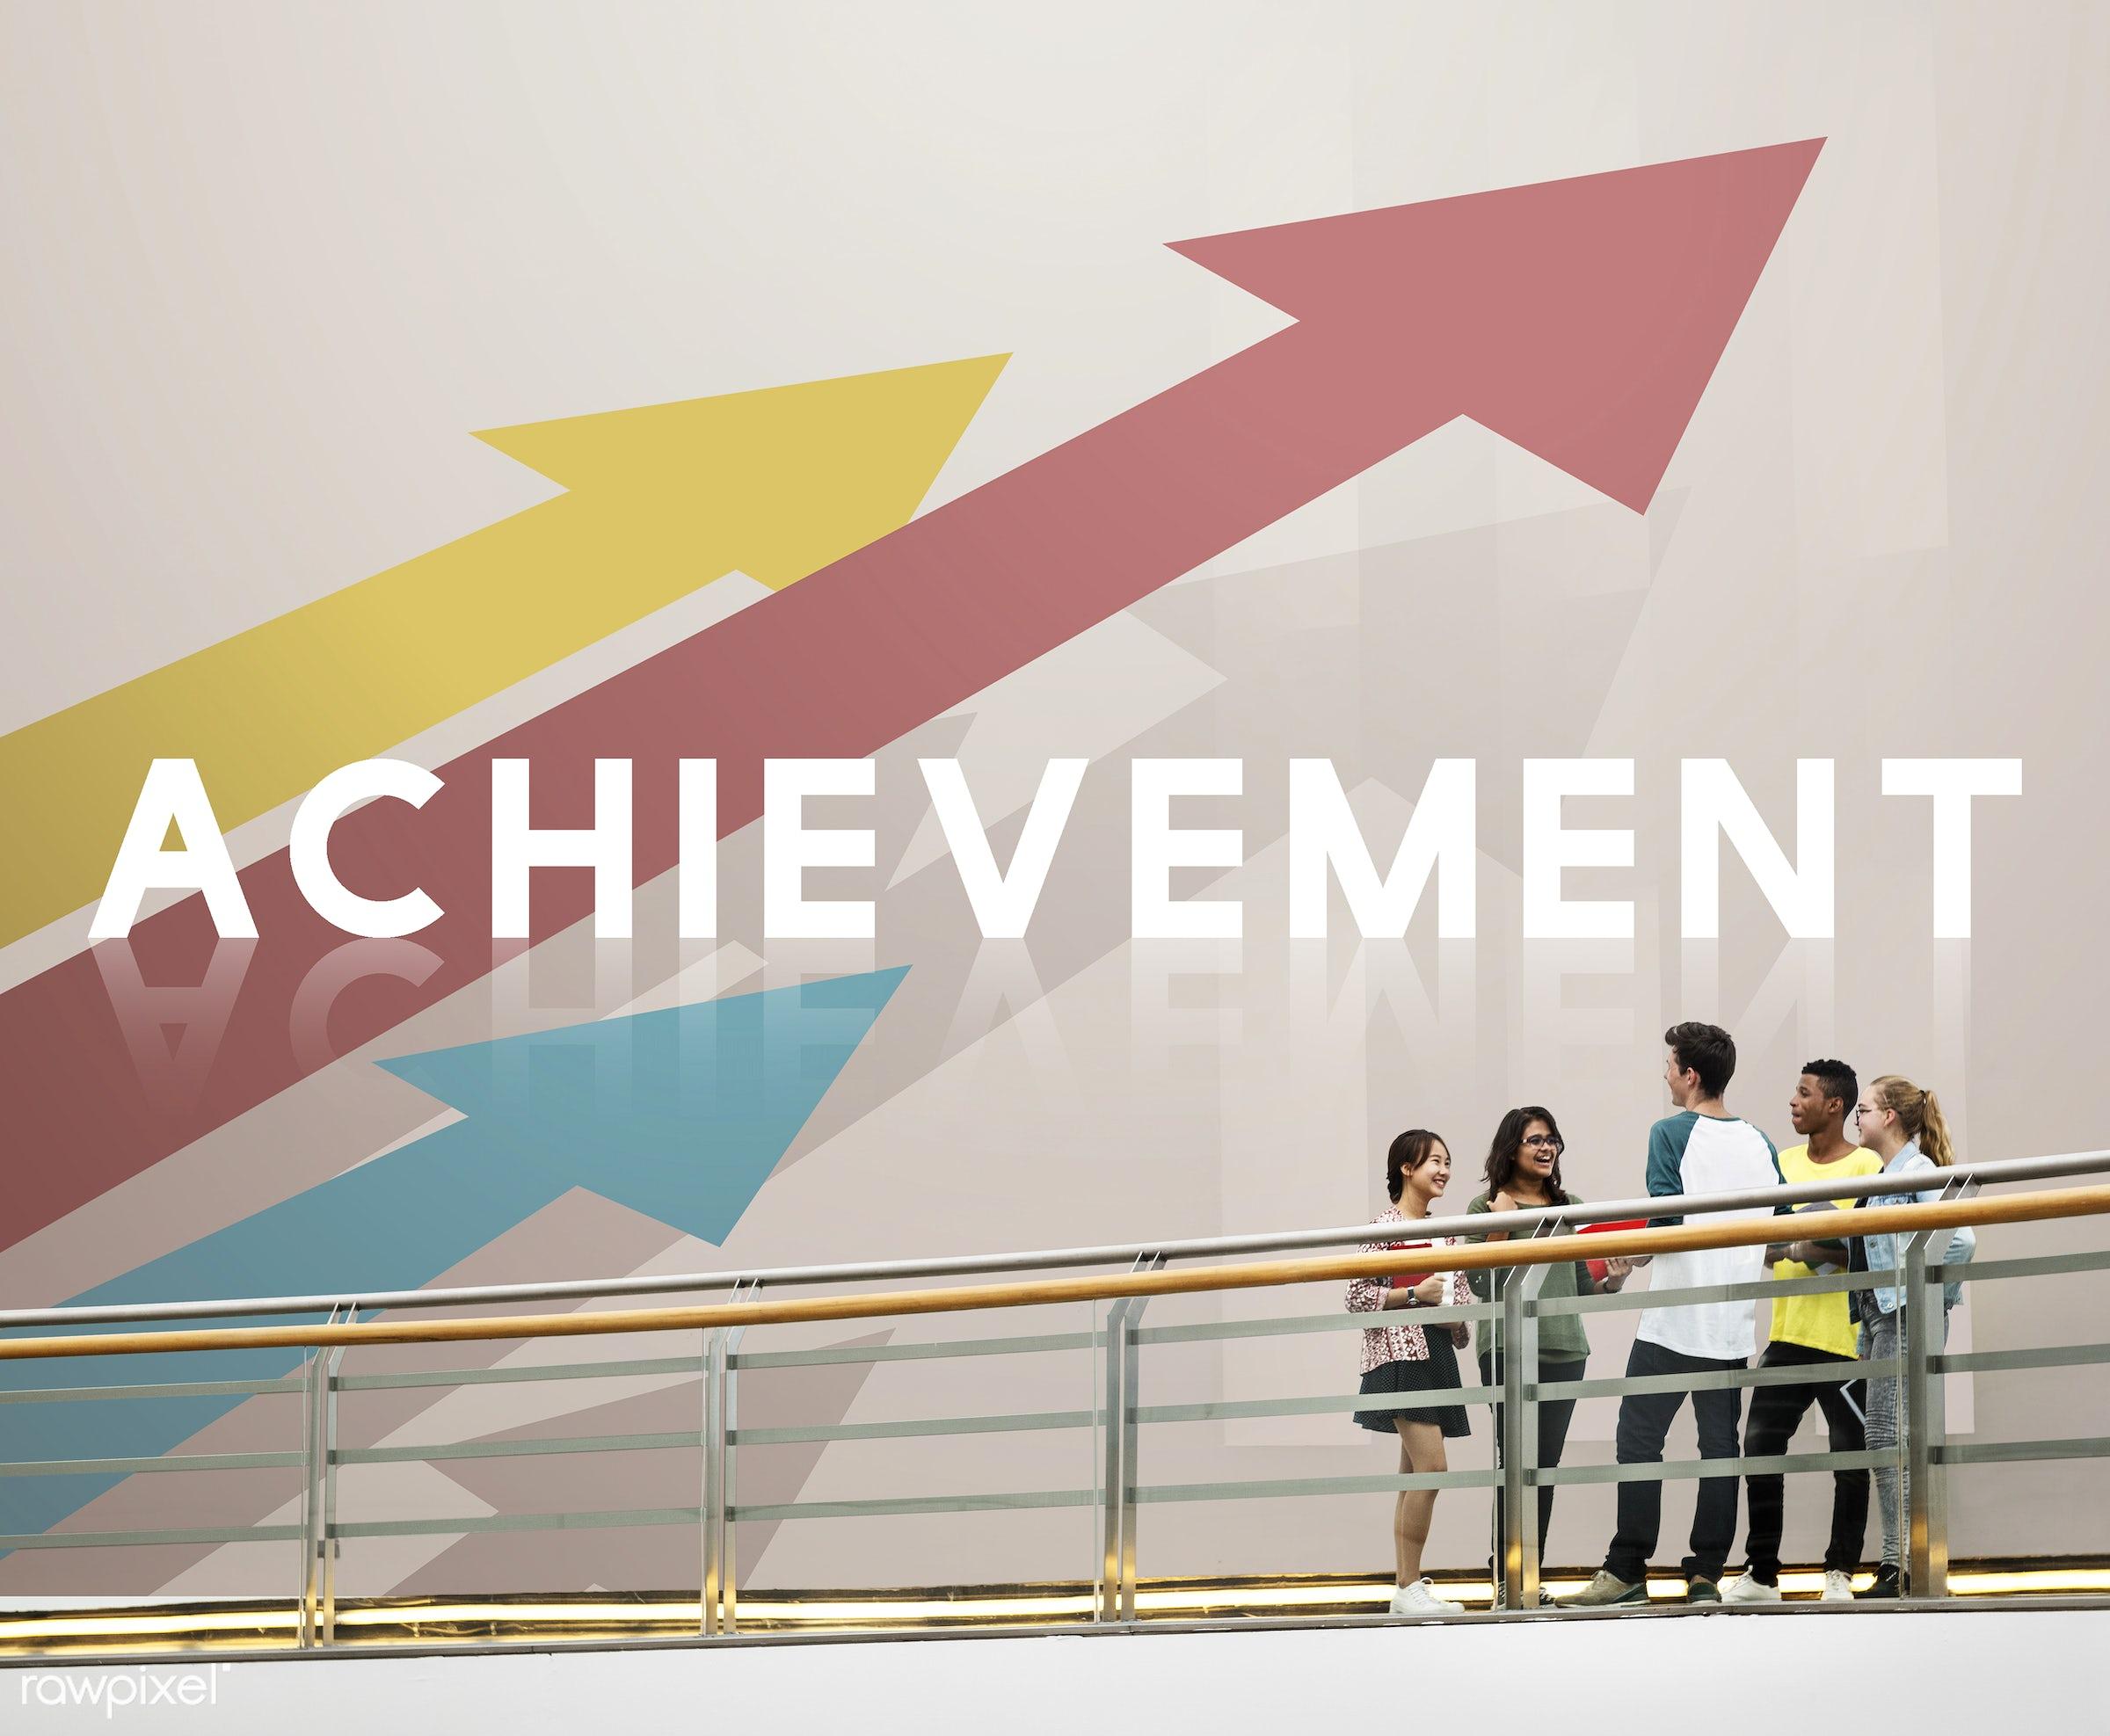 carrying, achievement, aim, arrows, book, books, boy, bridge, business, challenge, development, friends, friendship, girls,...